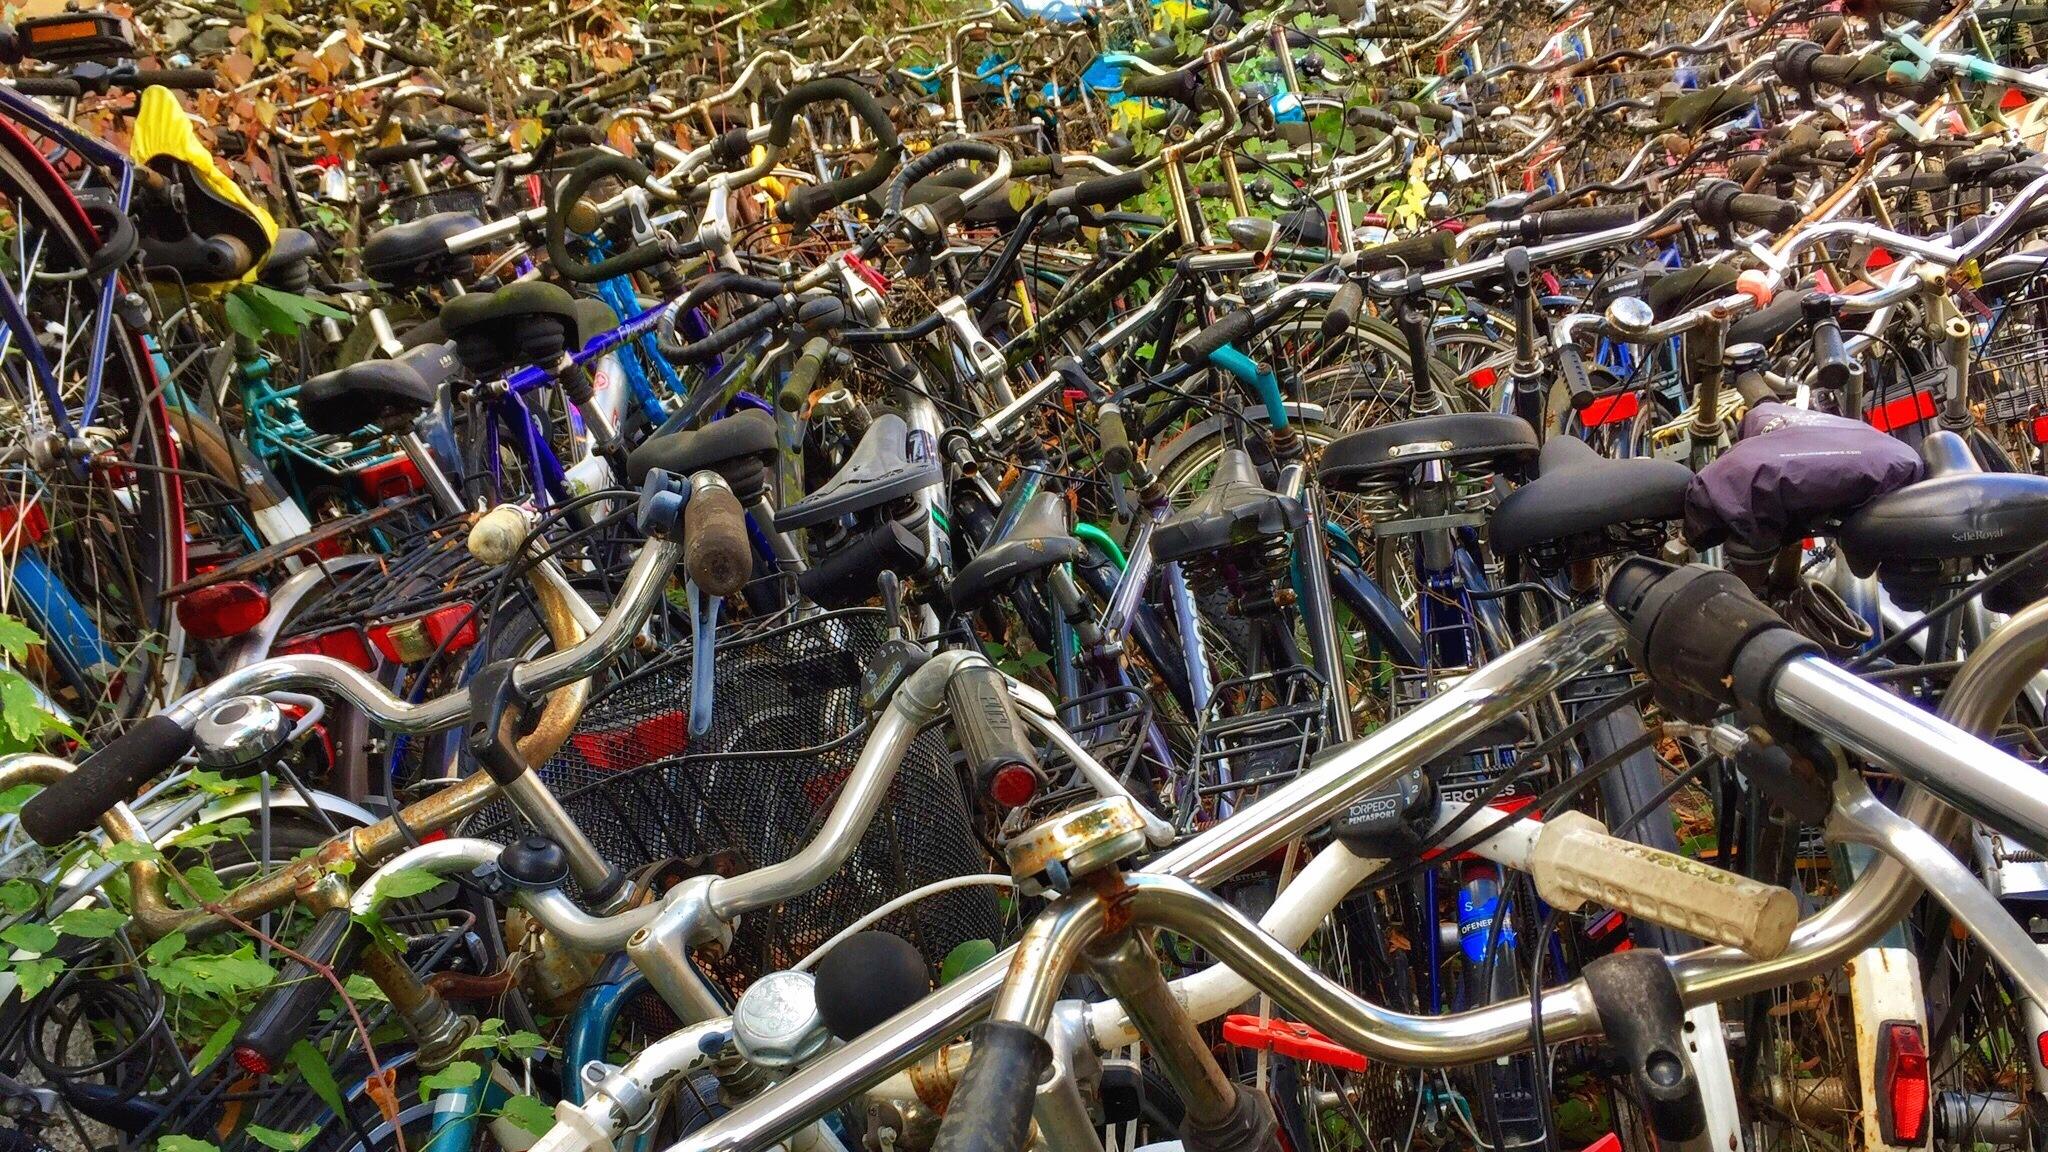 Fahrradfriedhof 3 by Harry Schäfer